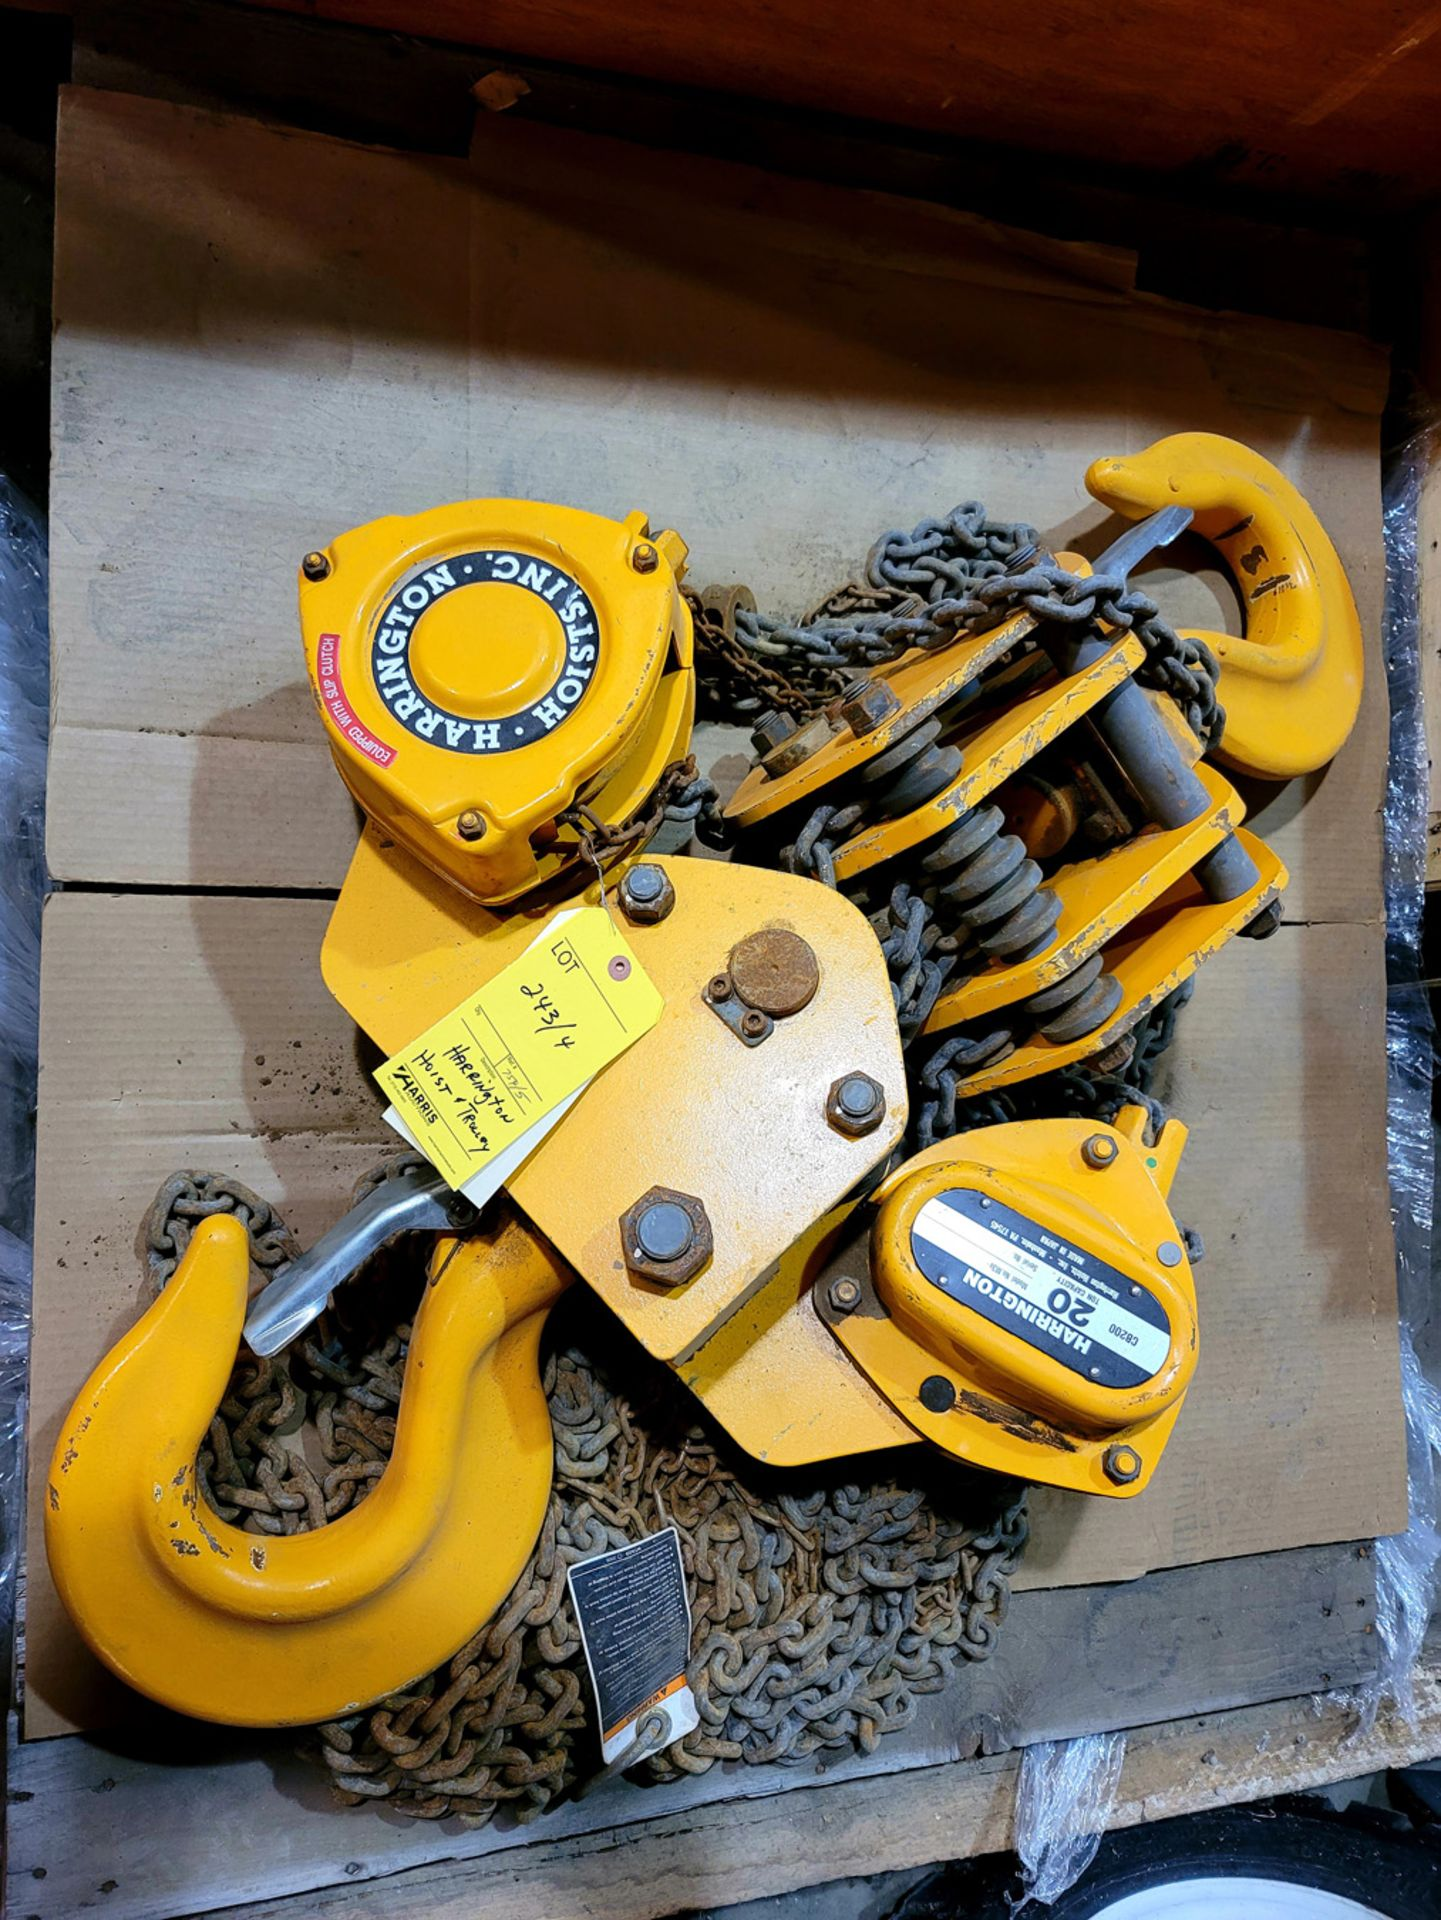 Harrington Hoist & Trolley, NEW in Crate - Image 3 of 3